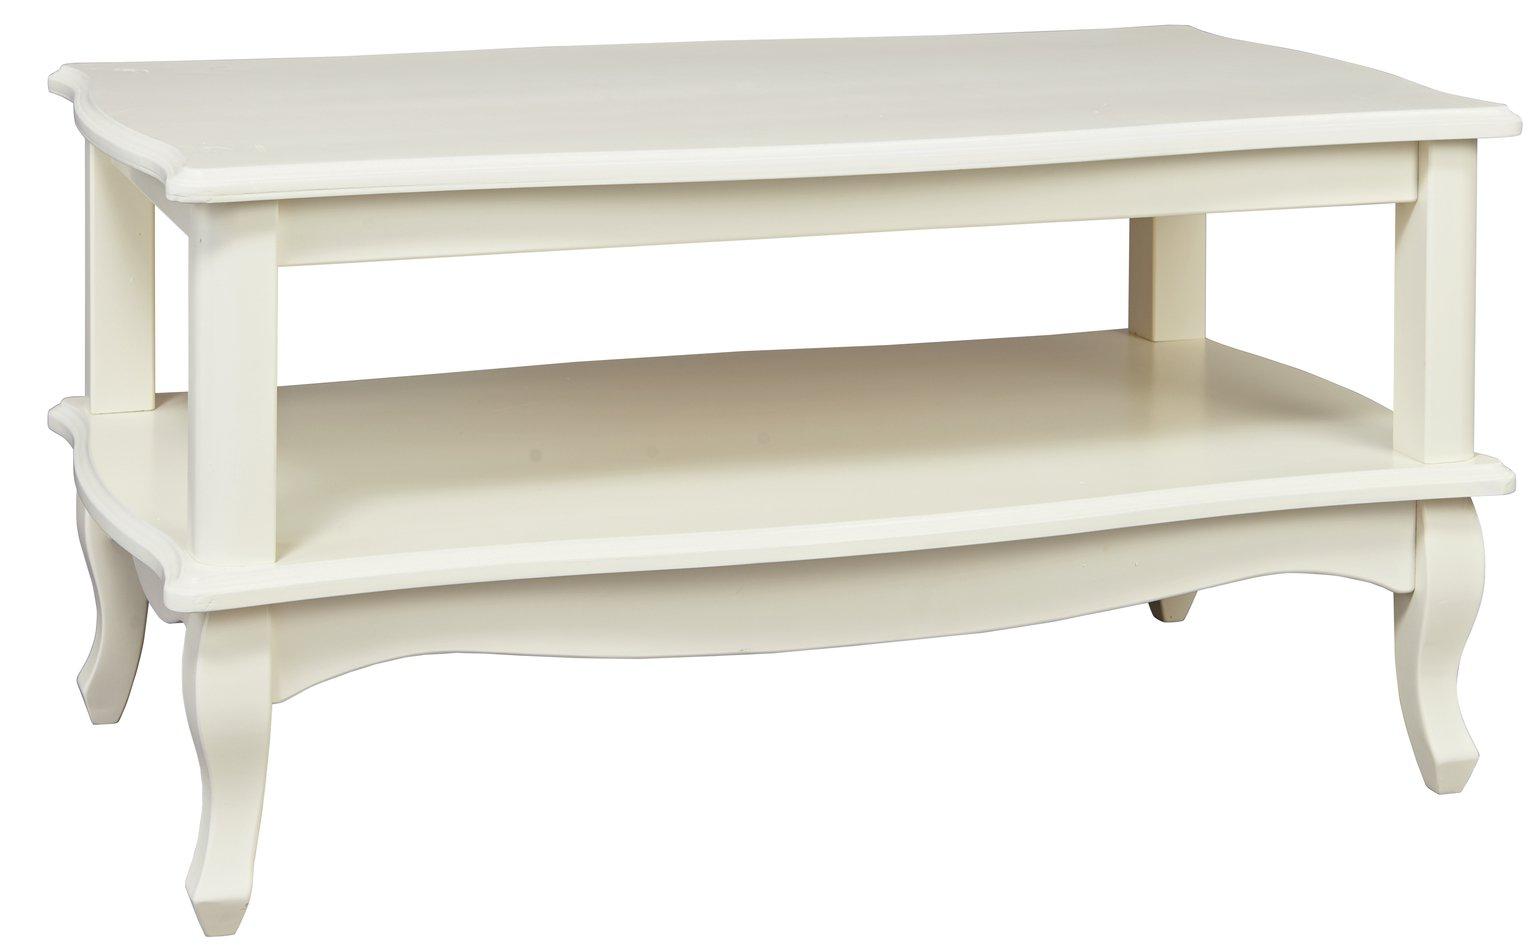 Argos Home Serenity Coffee Table - Off-White